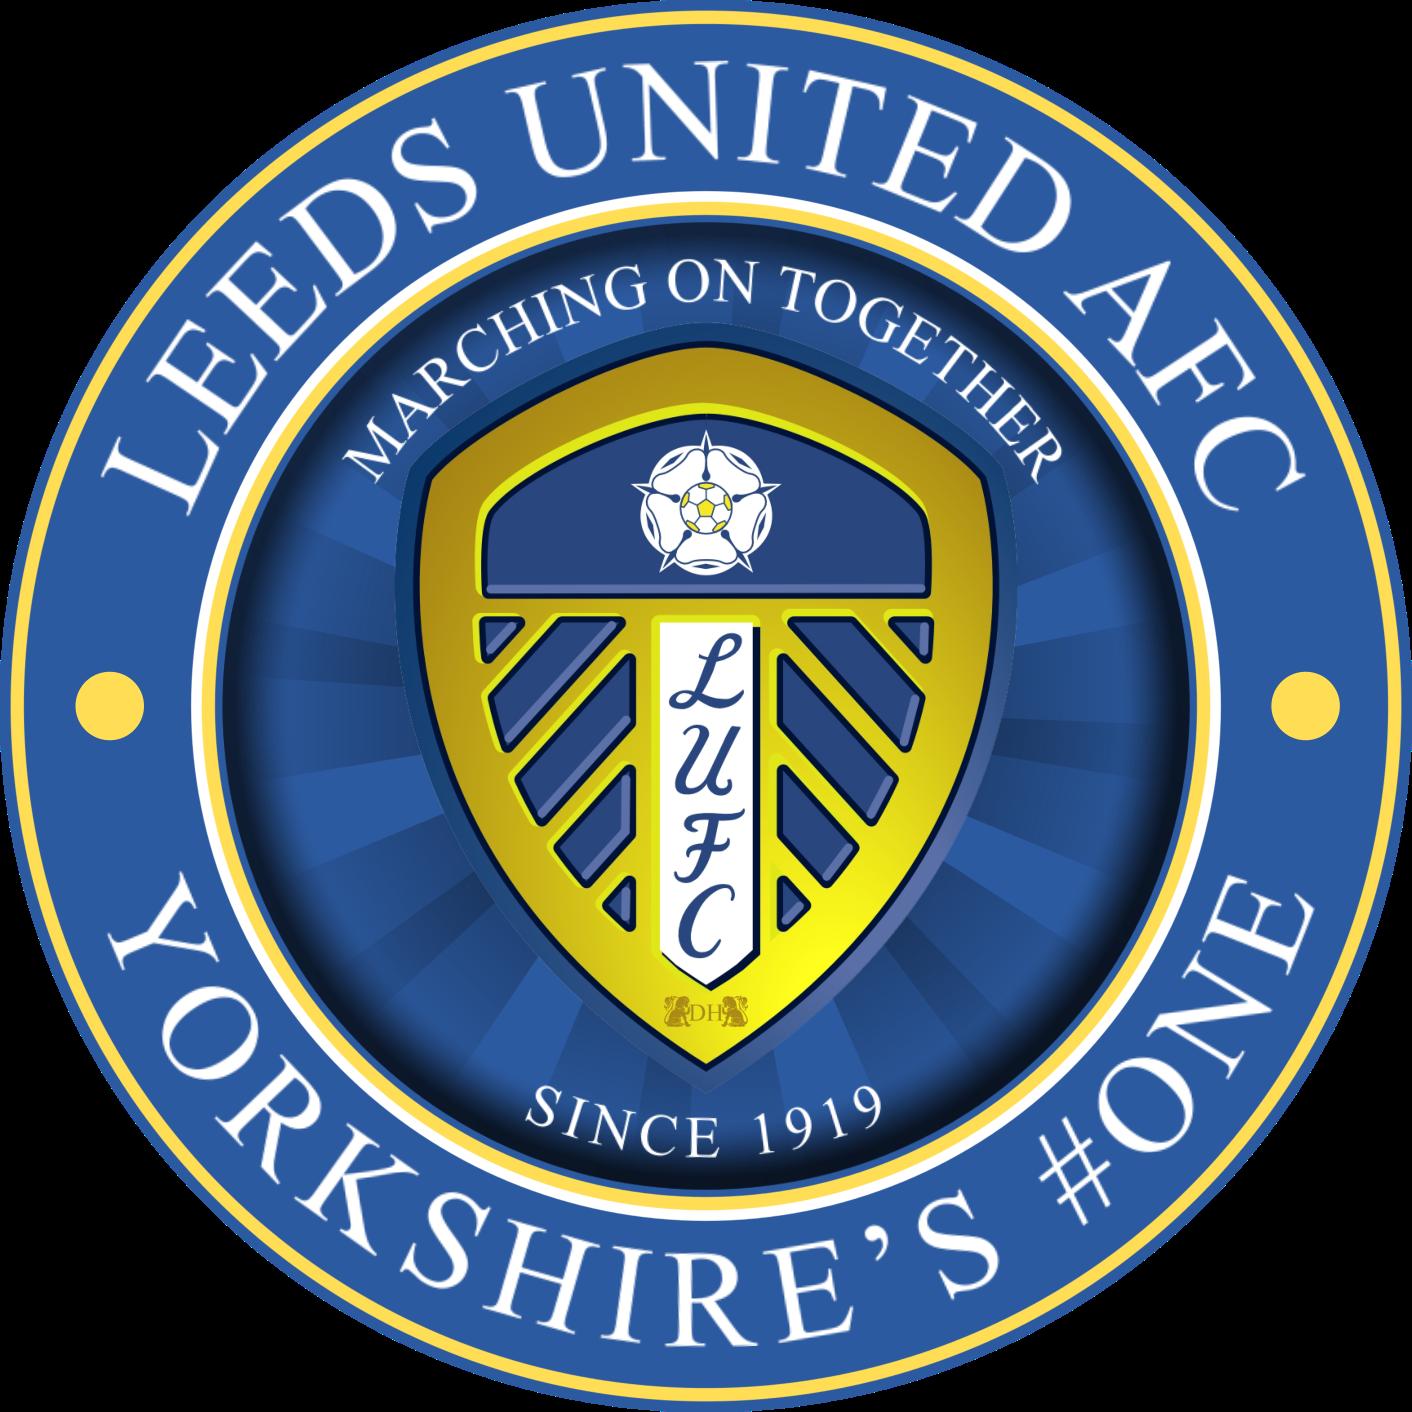 Pin By Bandizajn On Leeds United Afc Leeds United British Football Leeds